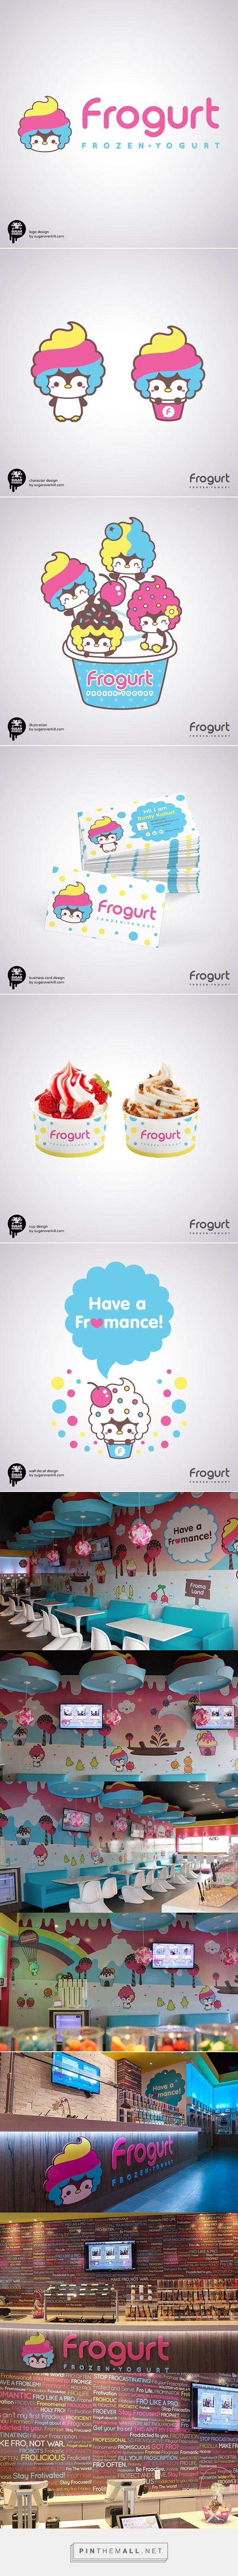 Frogurt Frozen Yogurt on Behance    Fivestar Branding – Design and Branding Agency & Inspiration Gallery